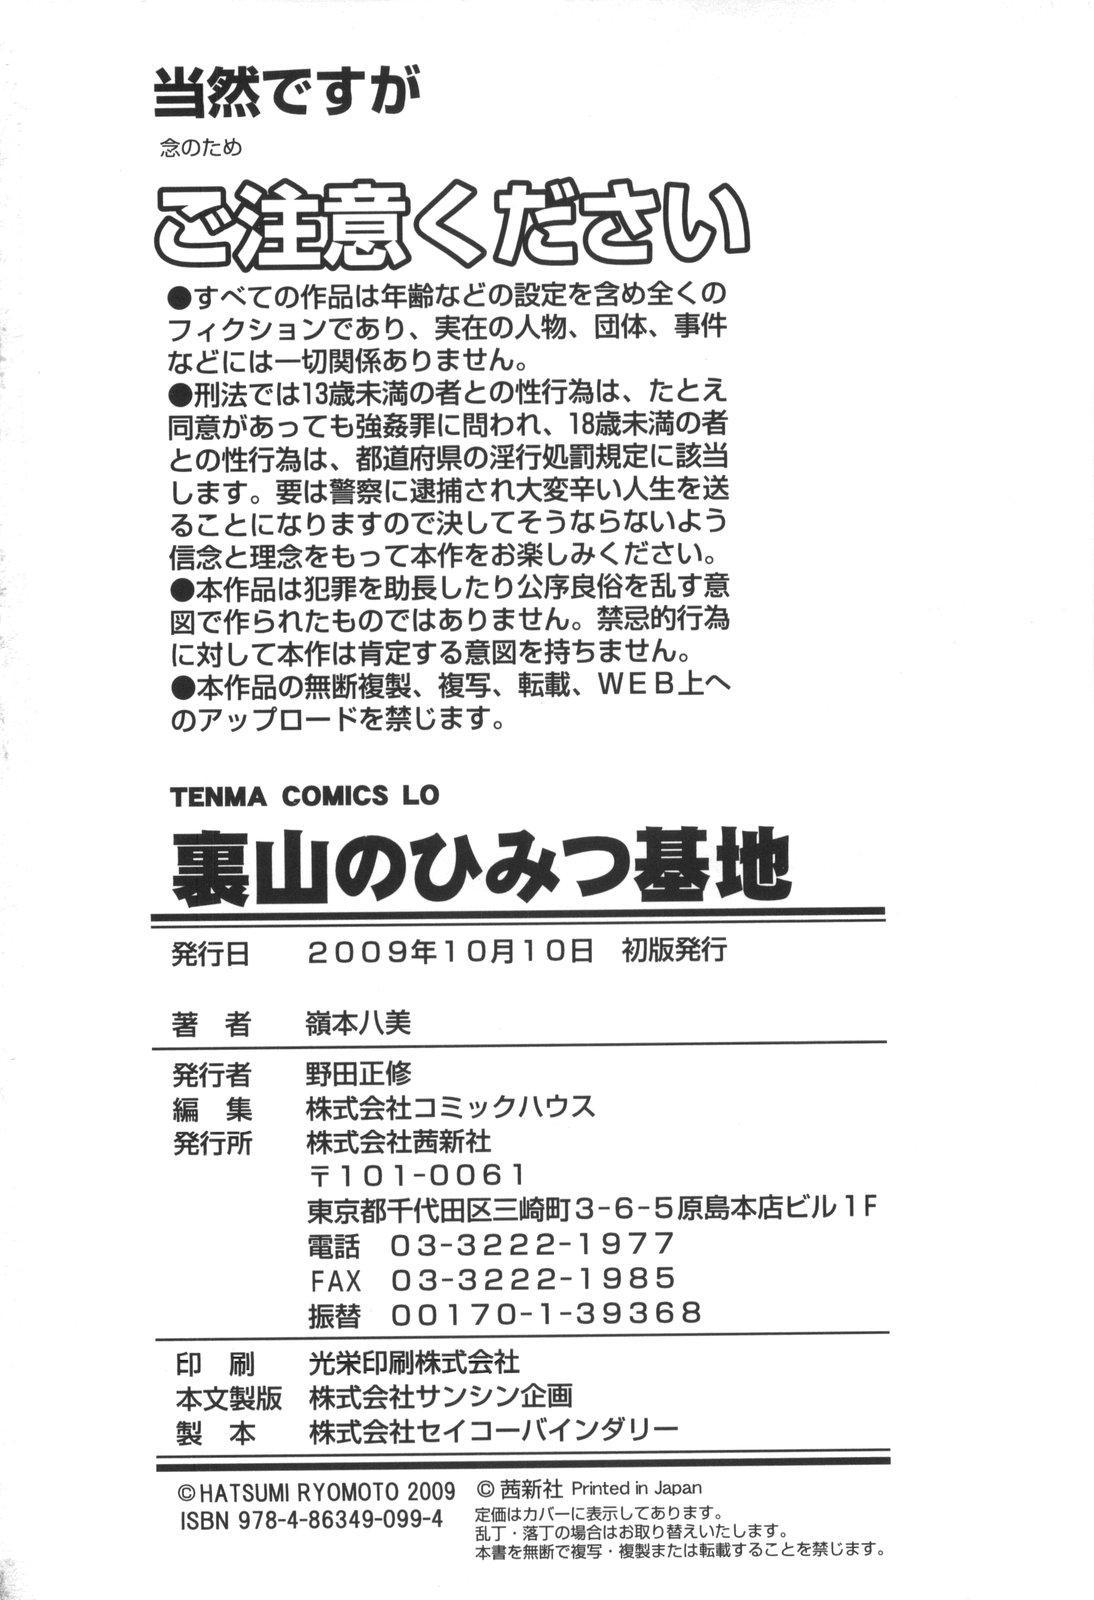 Urayama no Himitsu Kichi | 後山的秘密基地 216